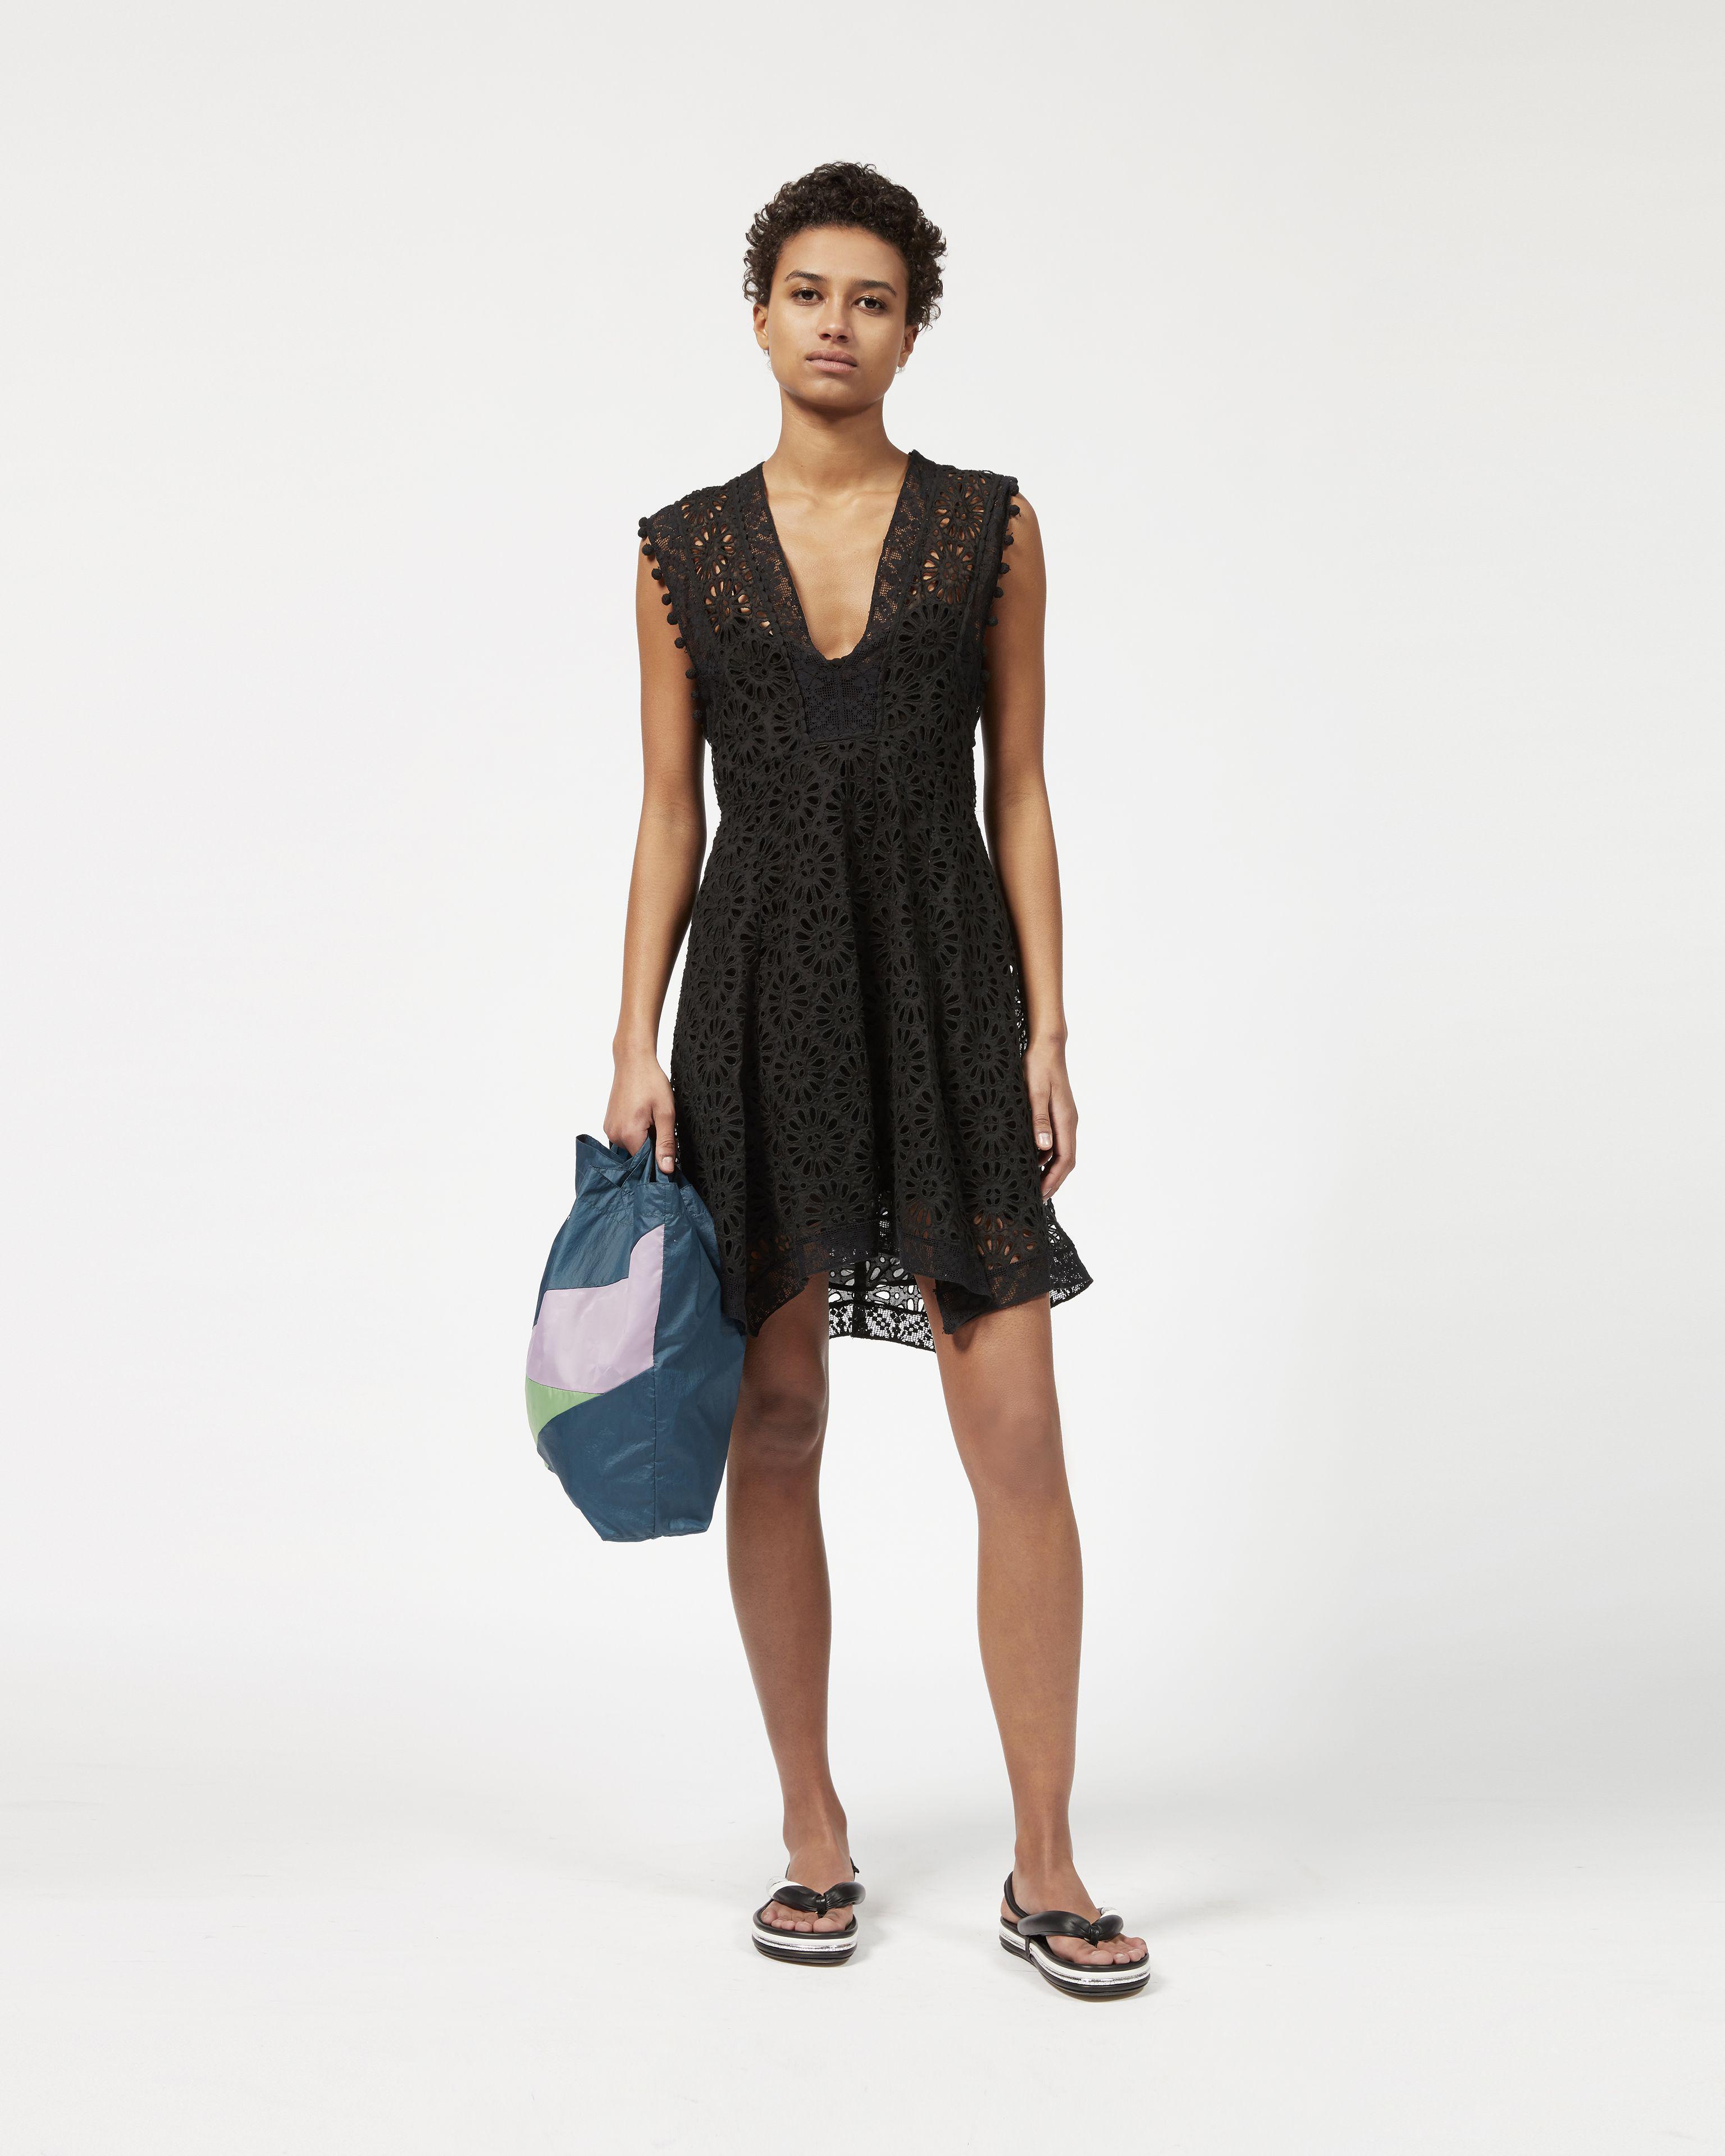 Womens Kierra Eyelet A-Line Dress Isabel Marant Discount Latest Cheap 100% Authentic ZFr7K55WC